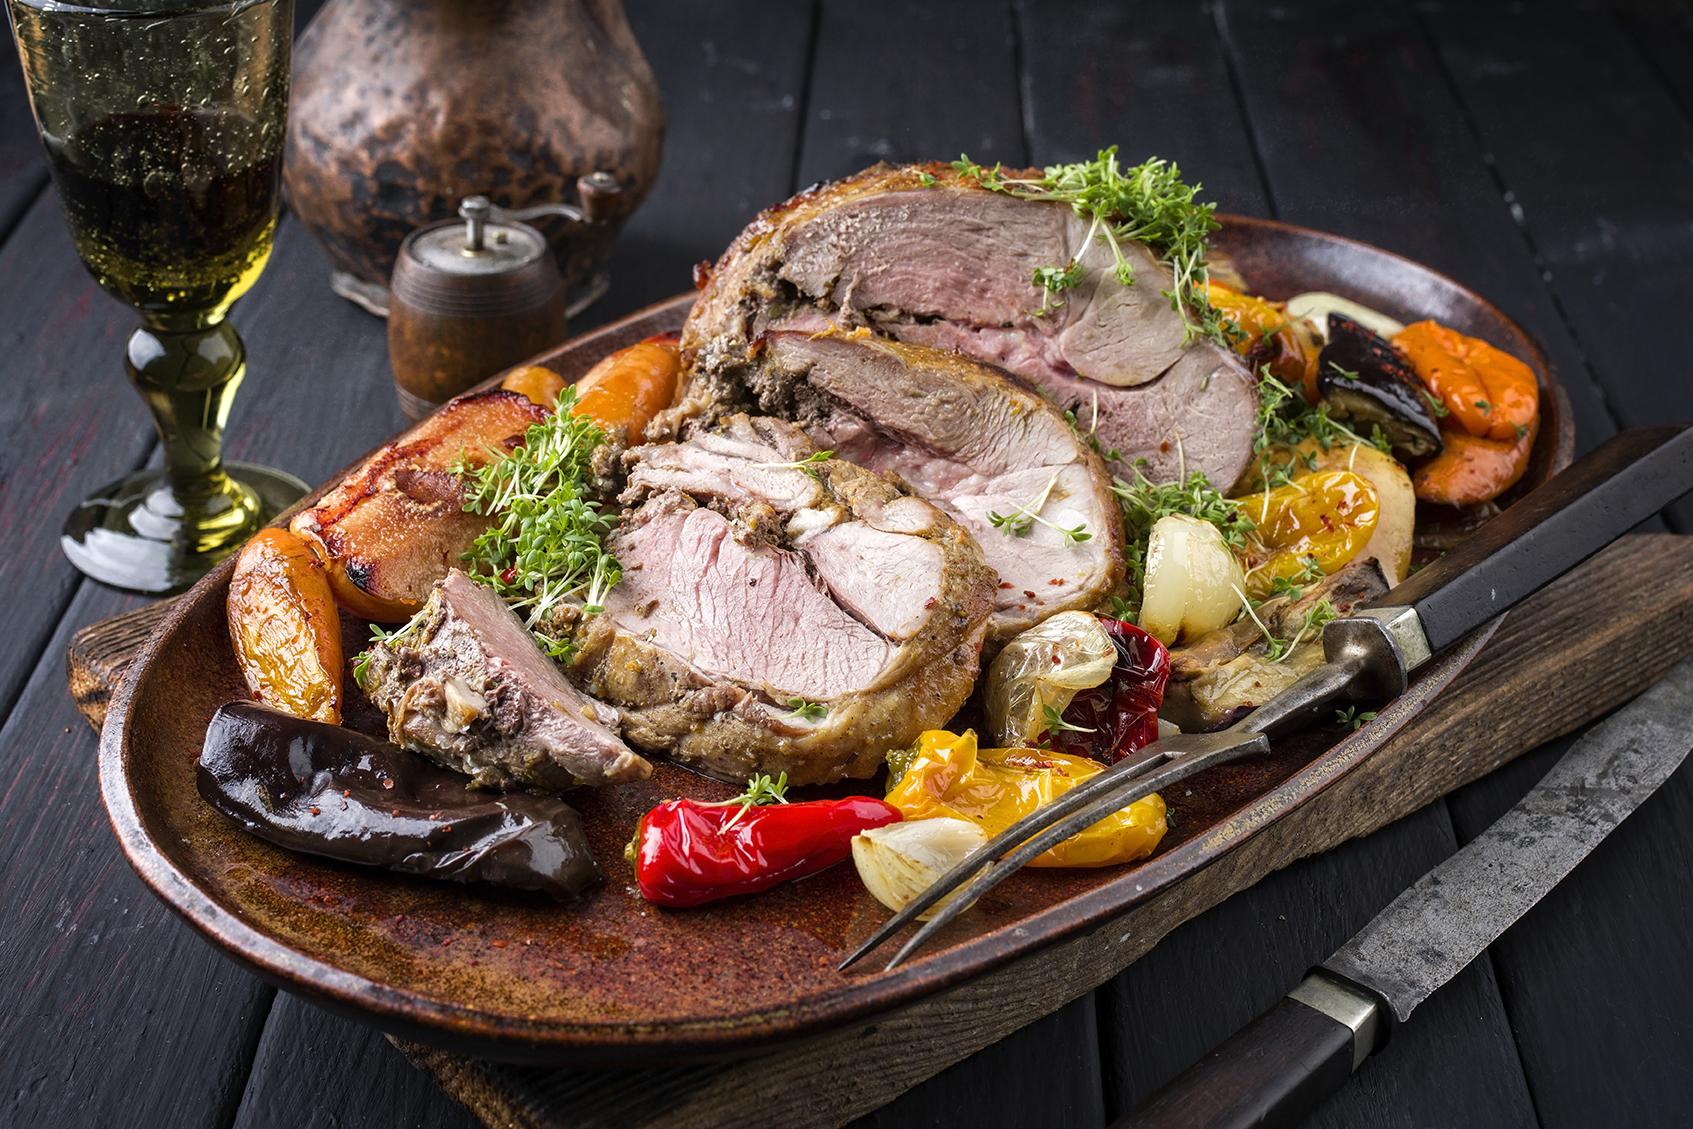 Sunday Lunch idea: Leg of Lamb